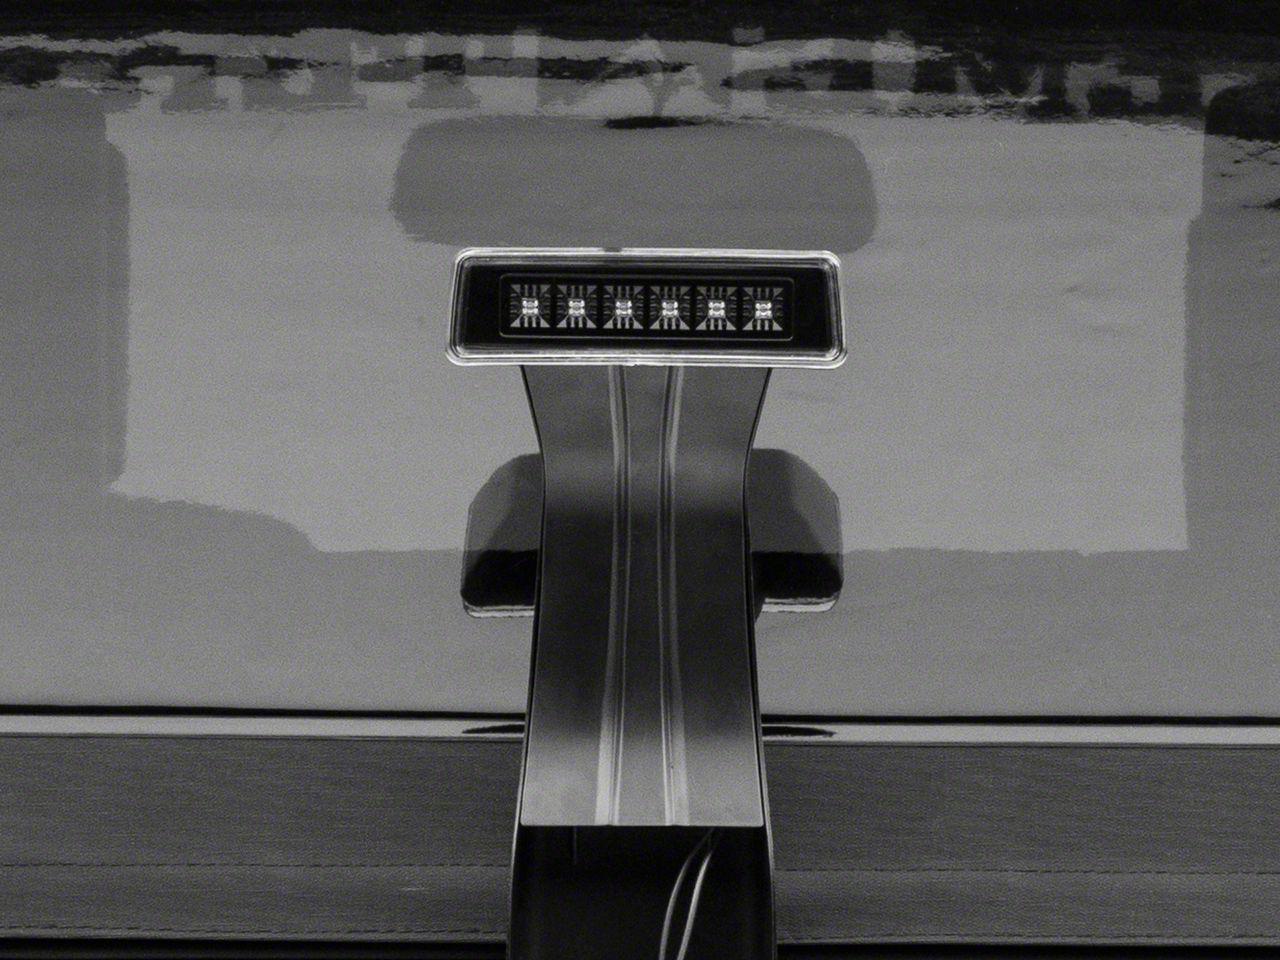 RedRock 4x4 LED Third Brake Light (07-18 Jeep Wrangler JK)